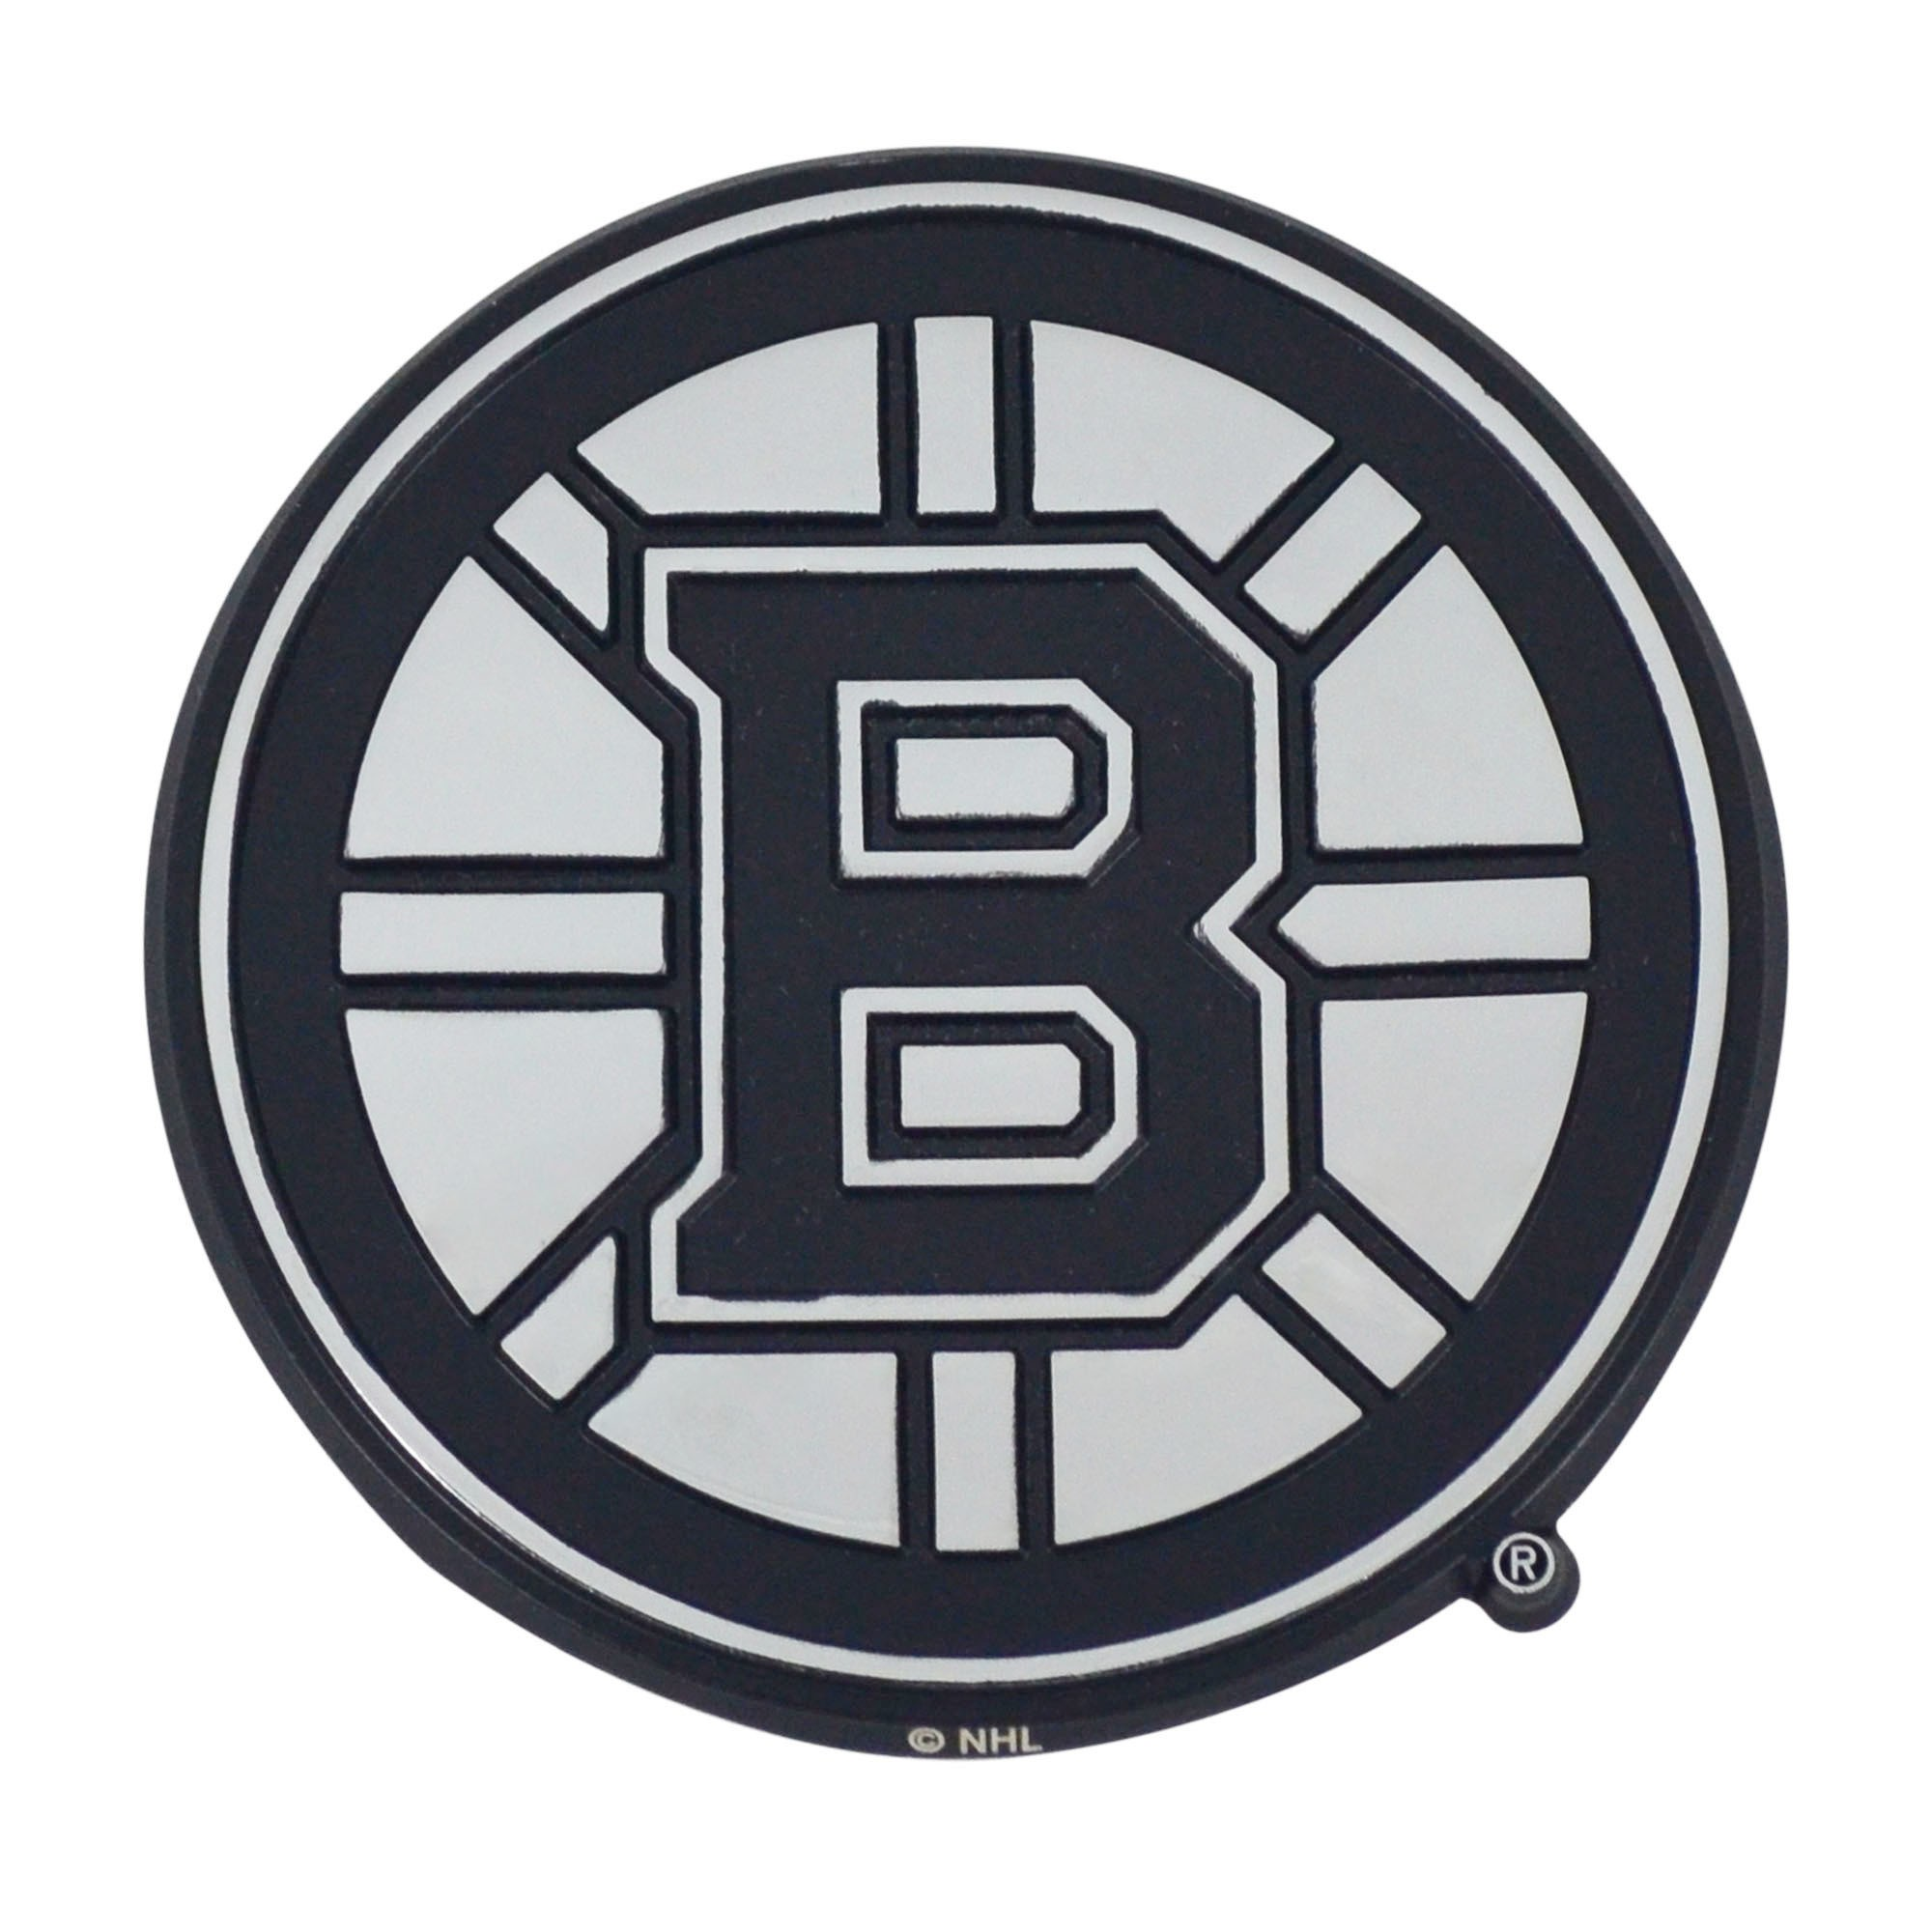 NHL Fan Mats Emblem - Boston Bruins